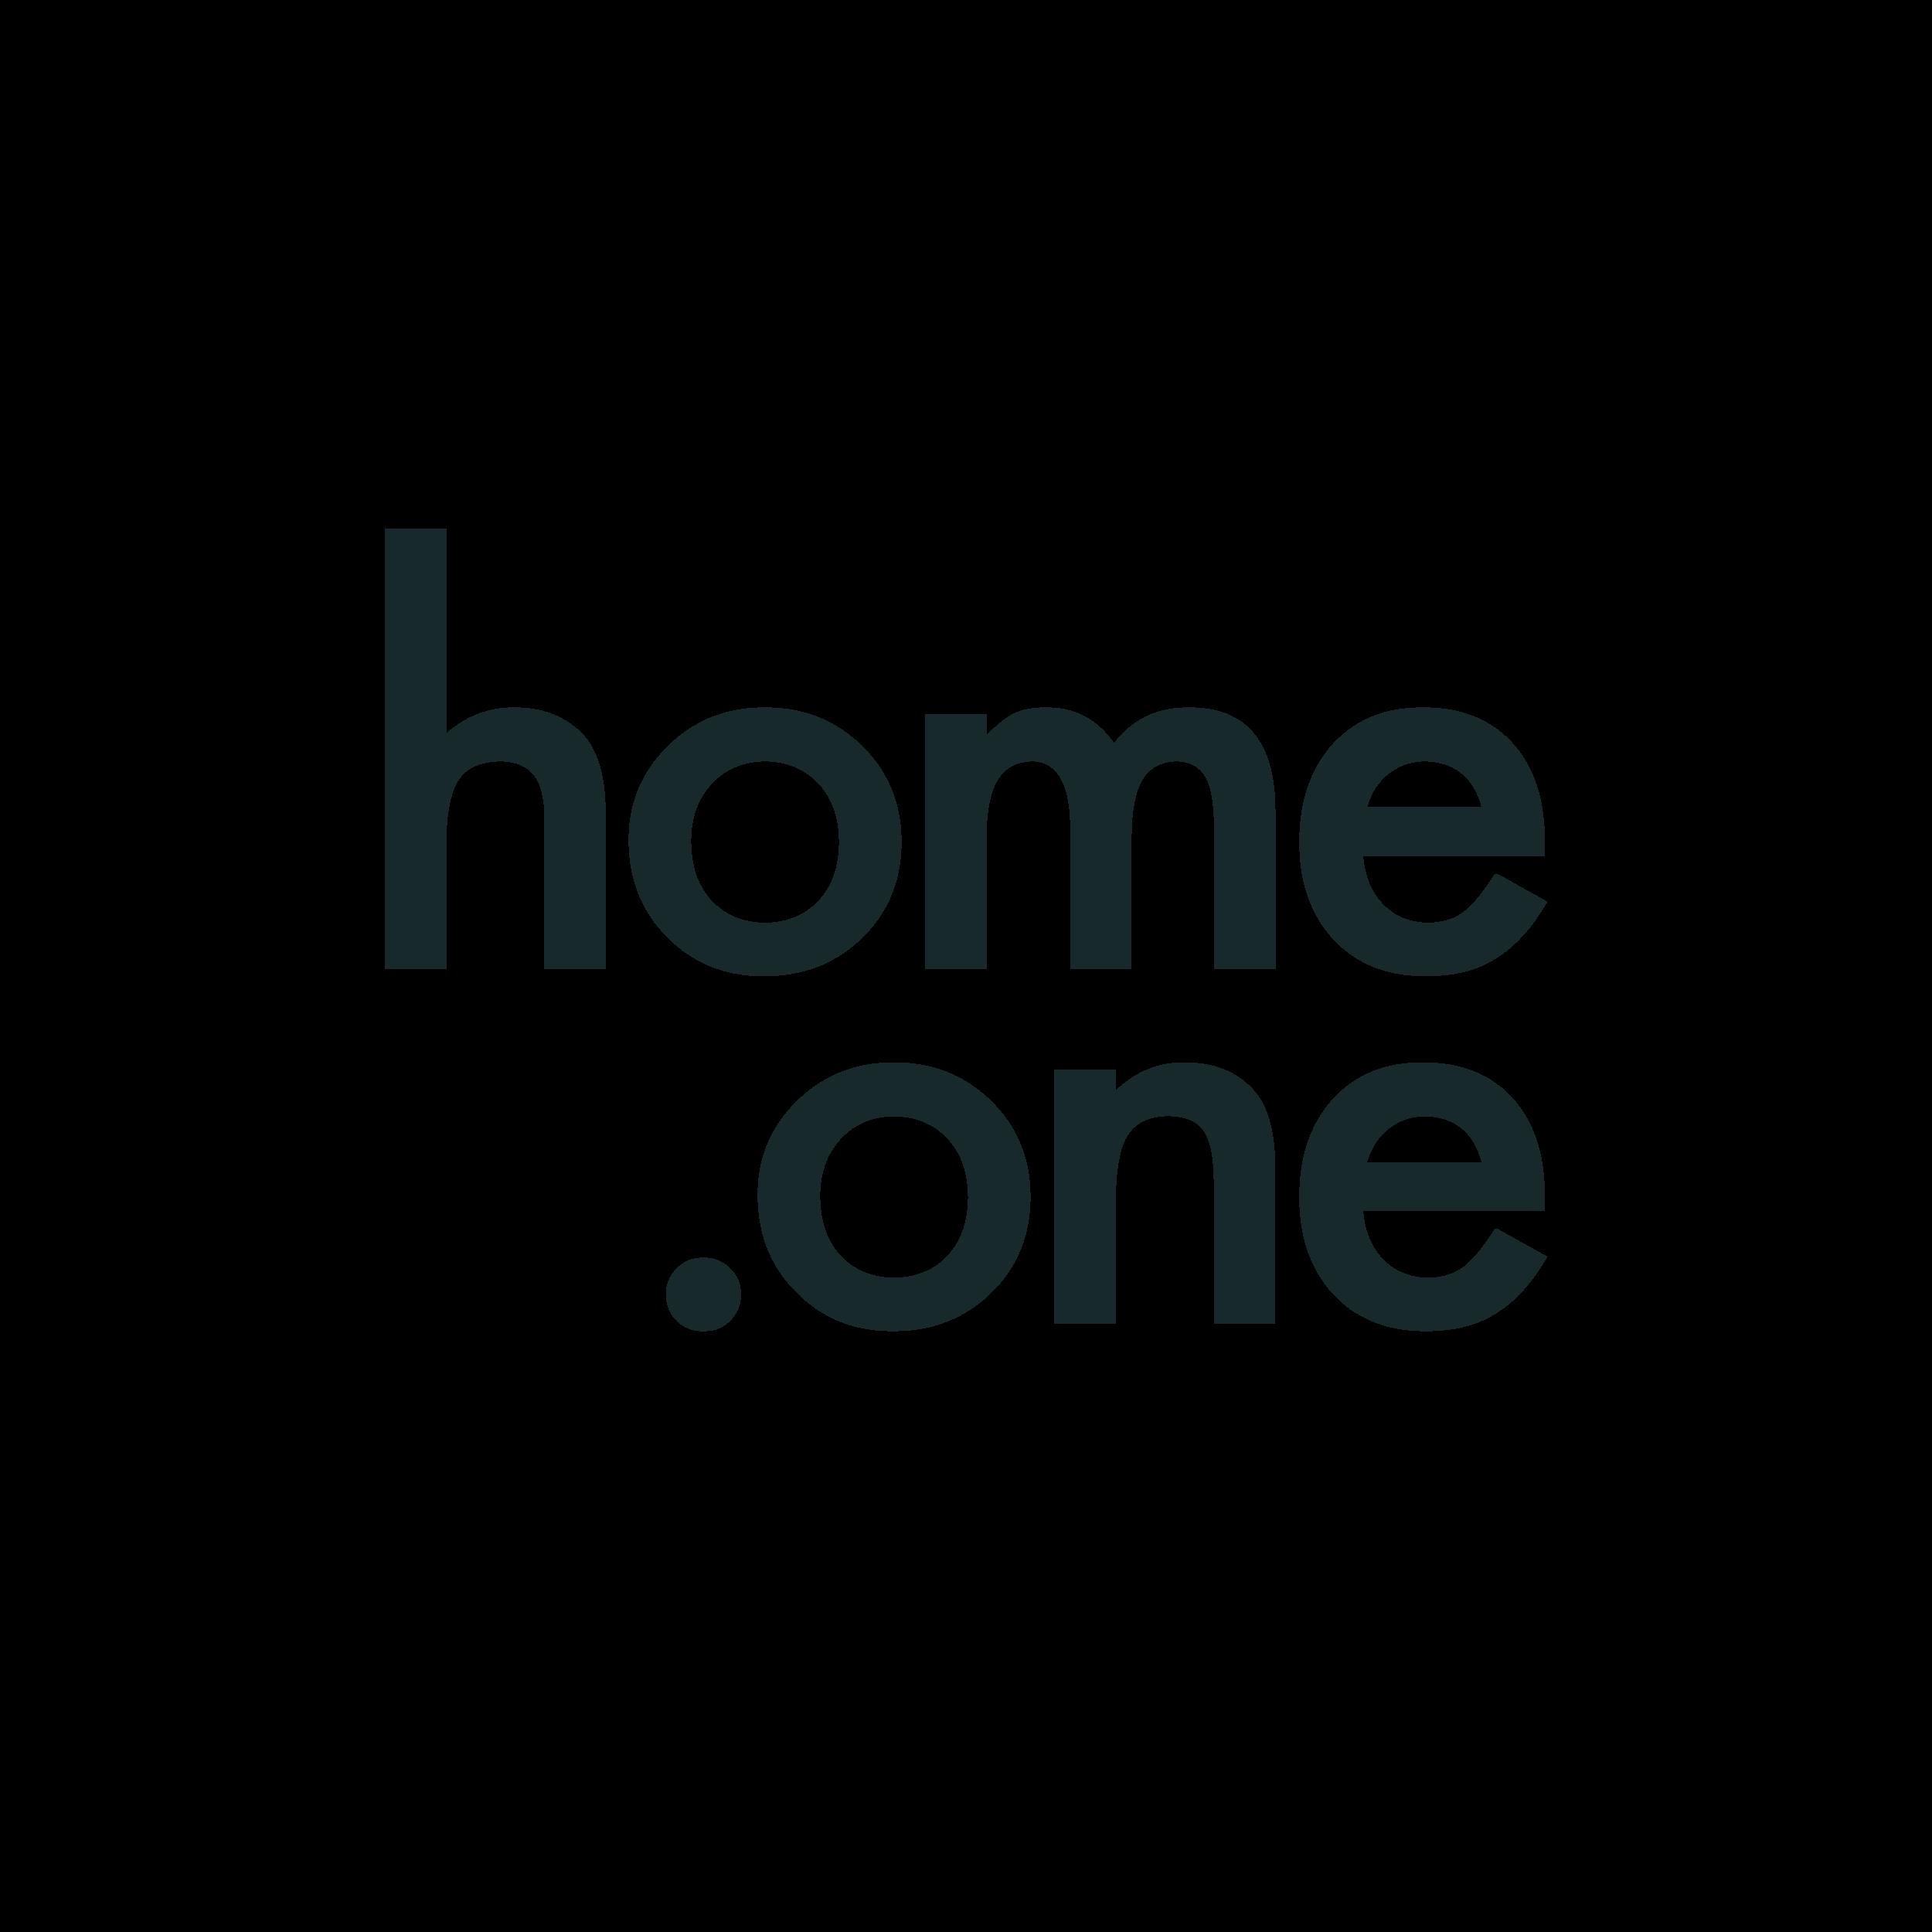 homeone_logo_2_Artboard 23 copy 2.png